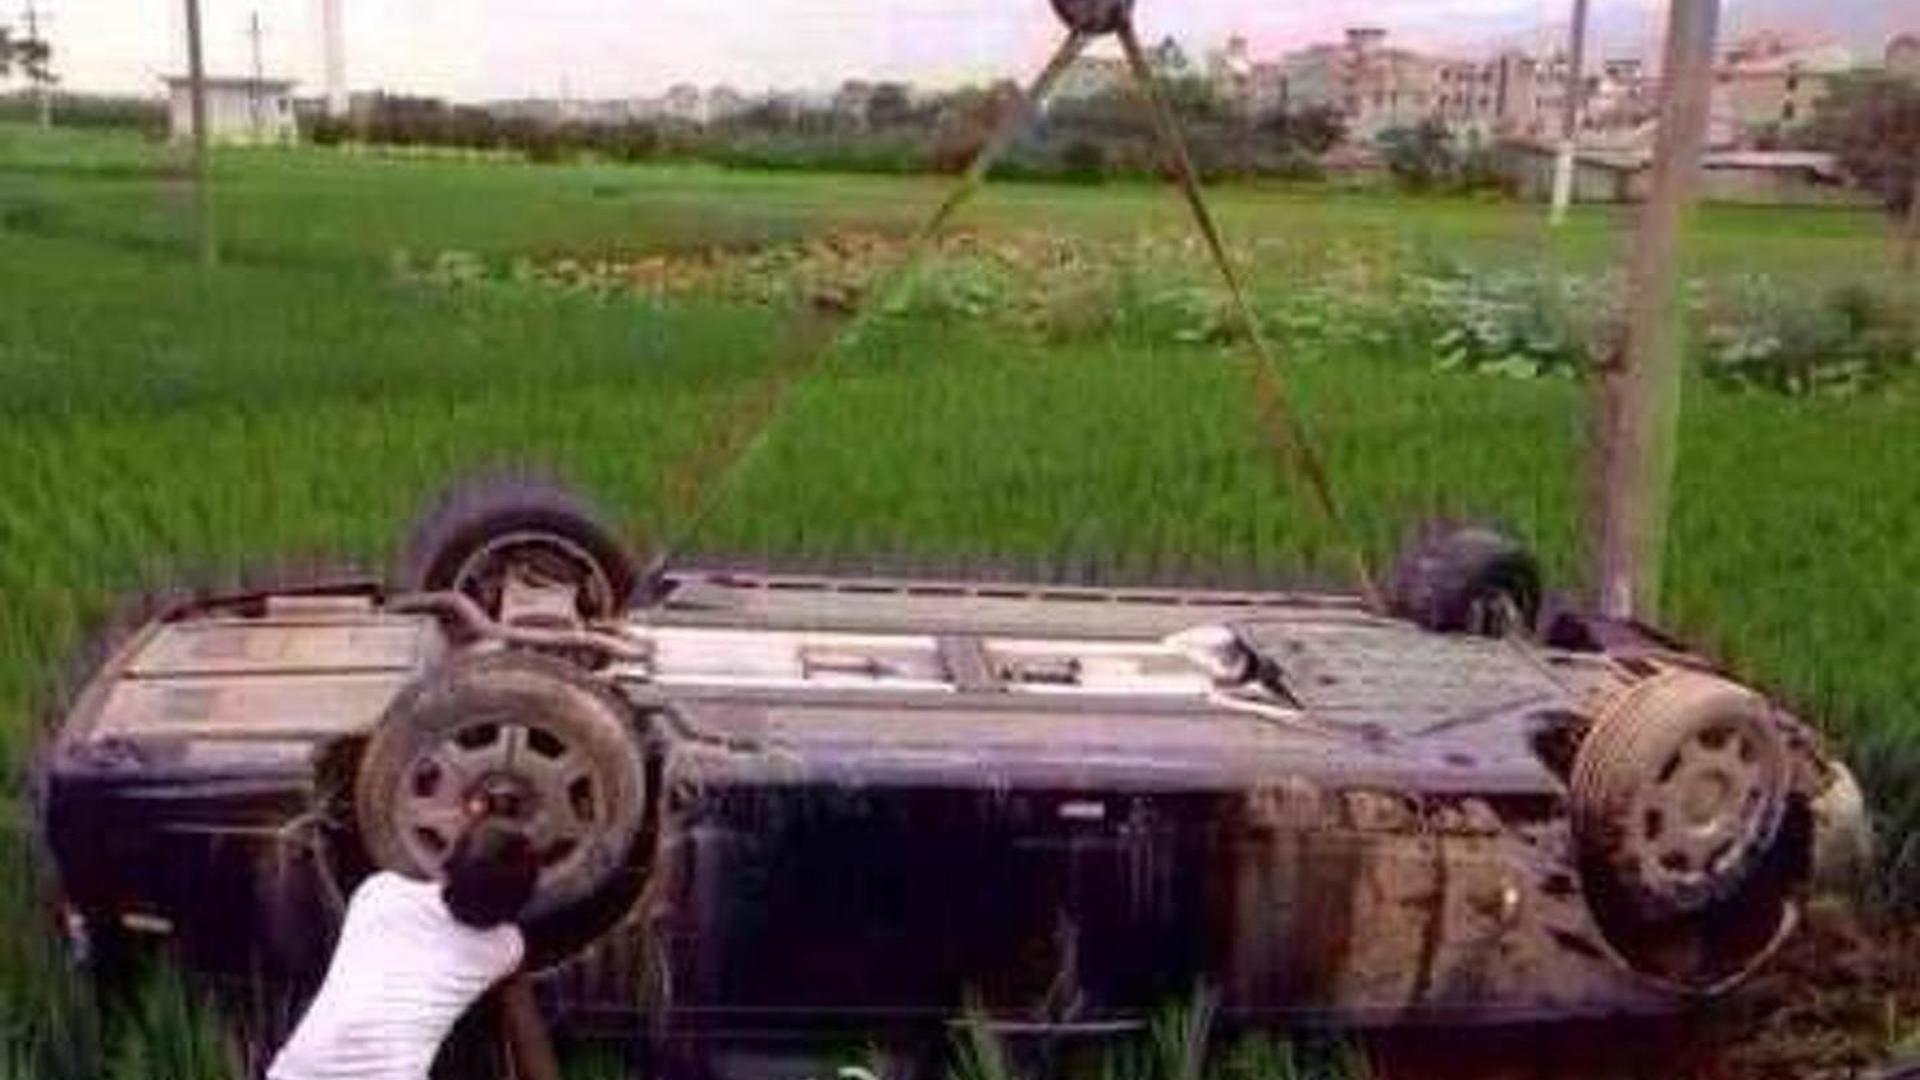 Rolls-Royce Phantom rolls onto field in China